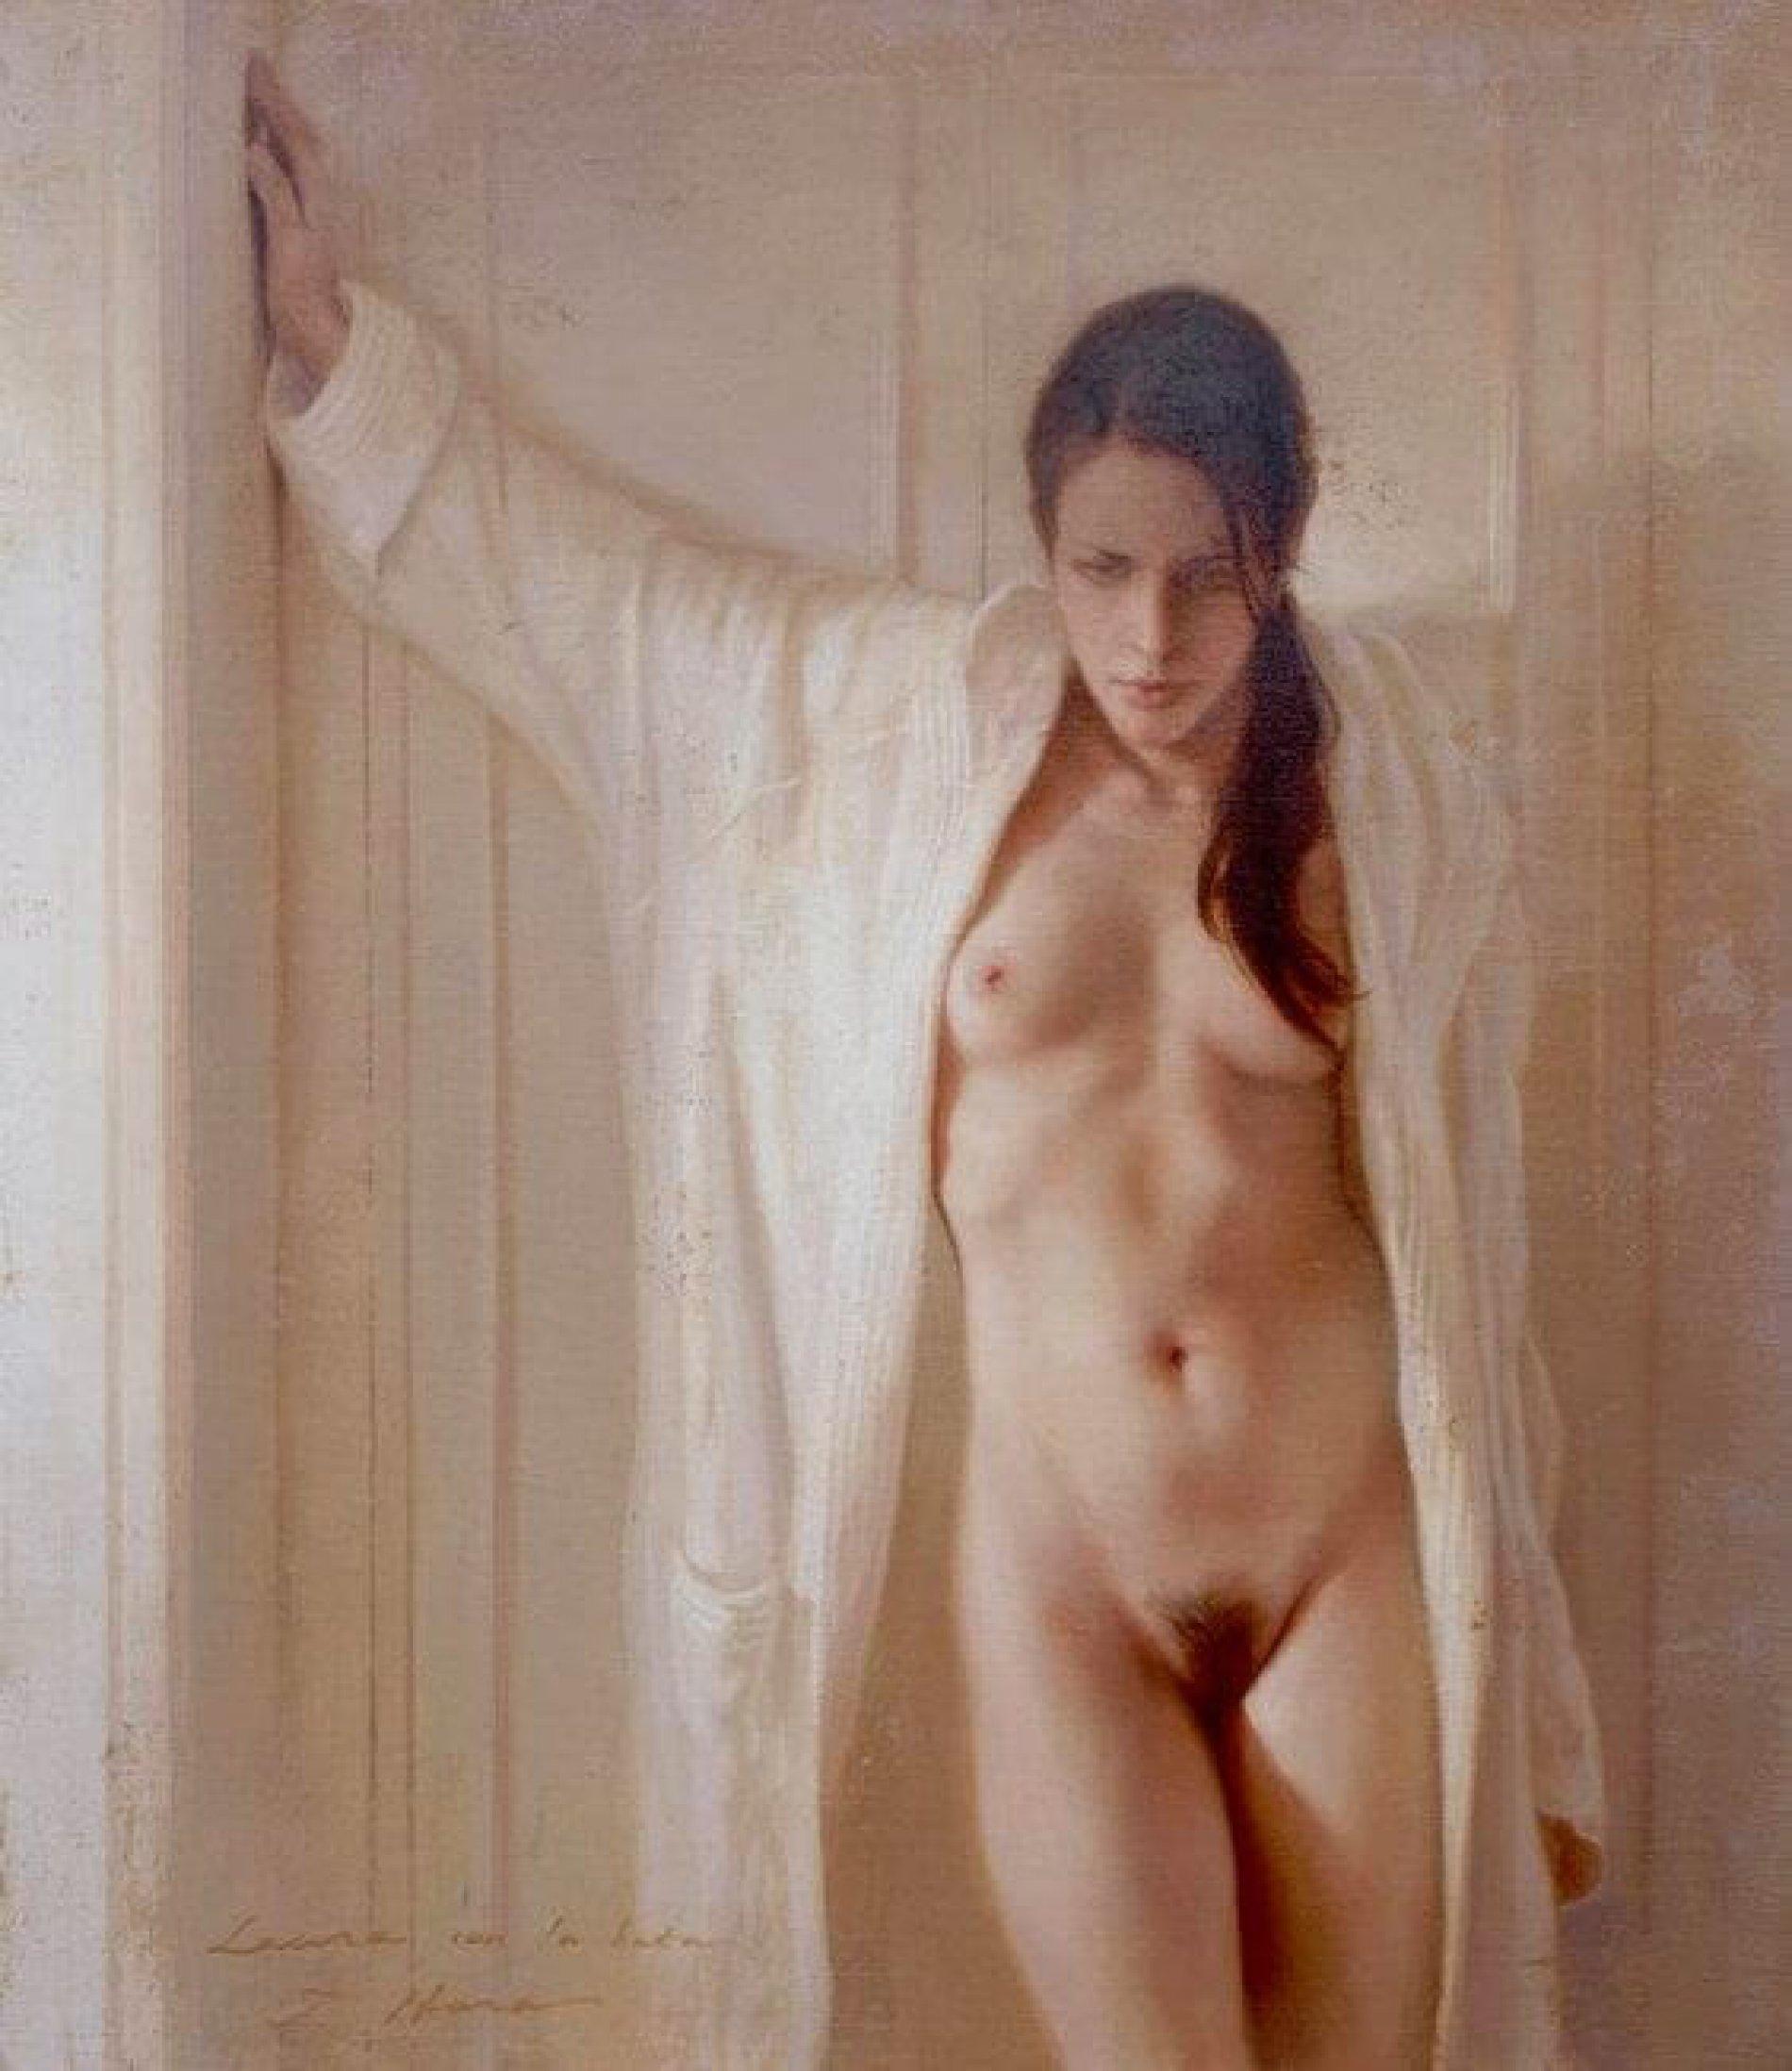 Kunstzinng met een vleugje seks: Takahiro Hara